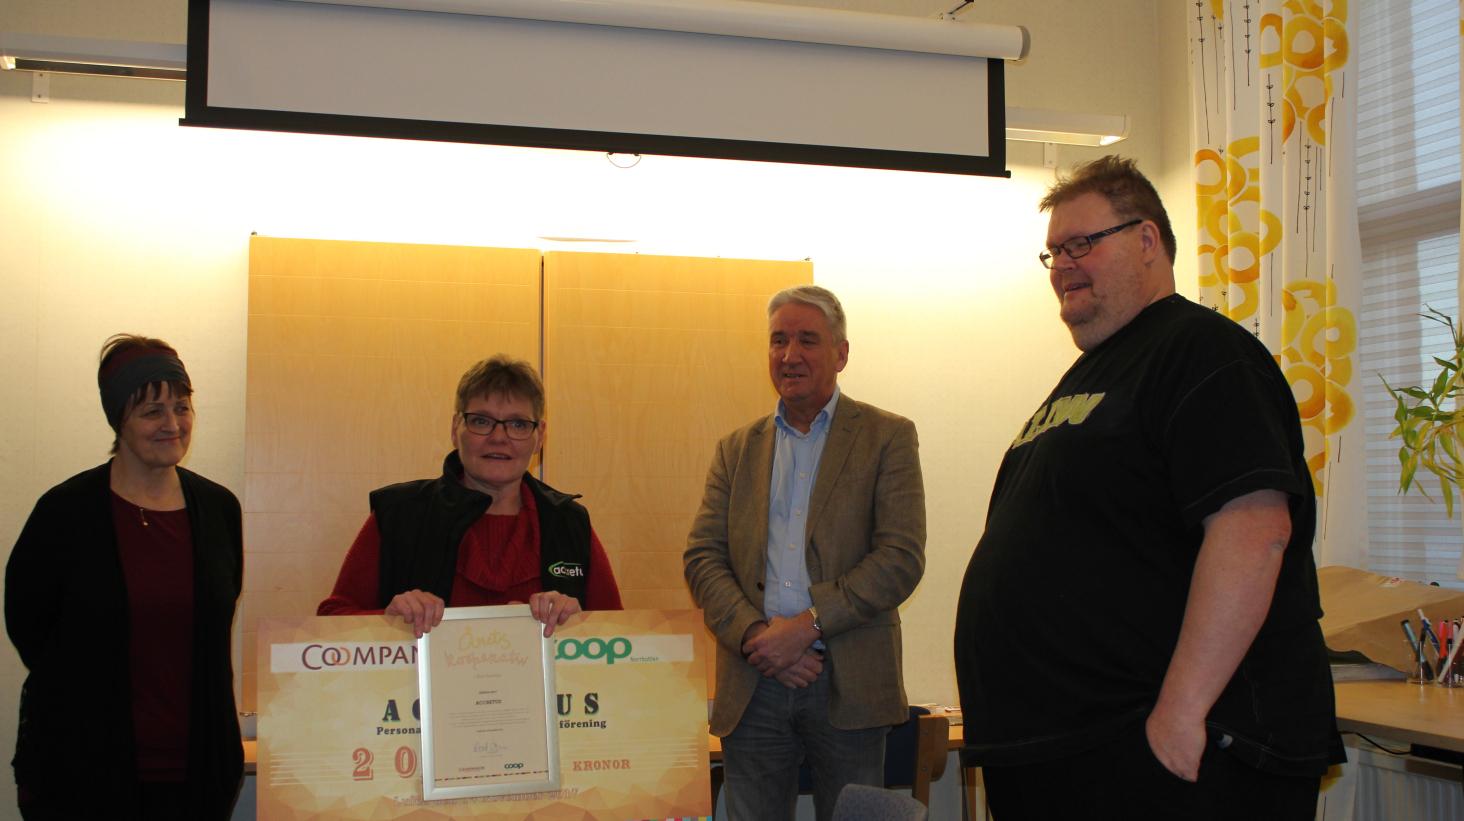 Accretus får utmärkelsen årets kooperativa verksamhet i Norrbotten